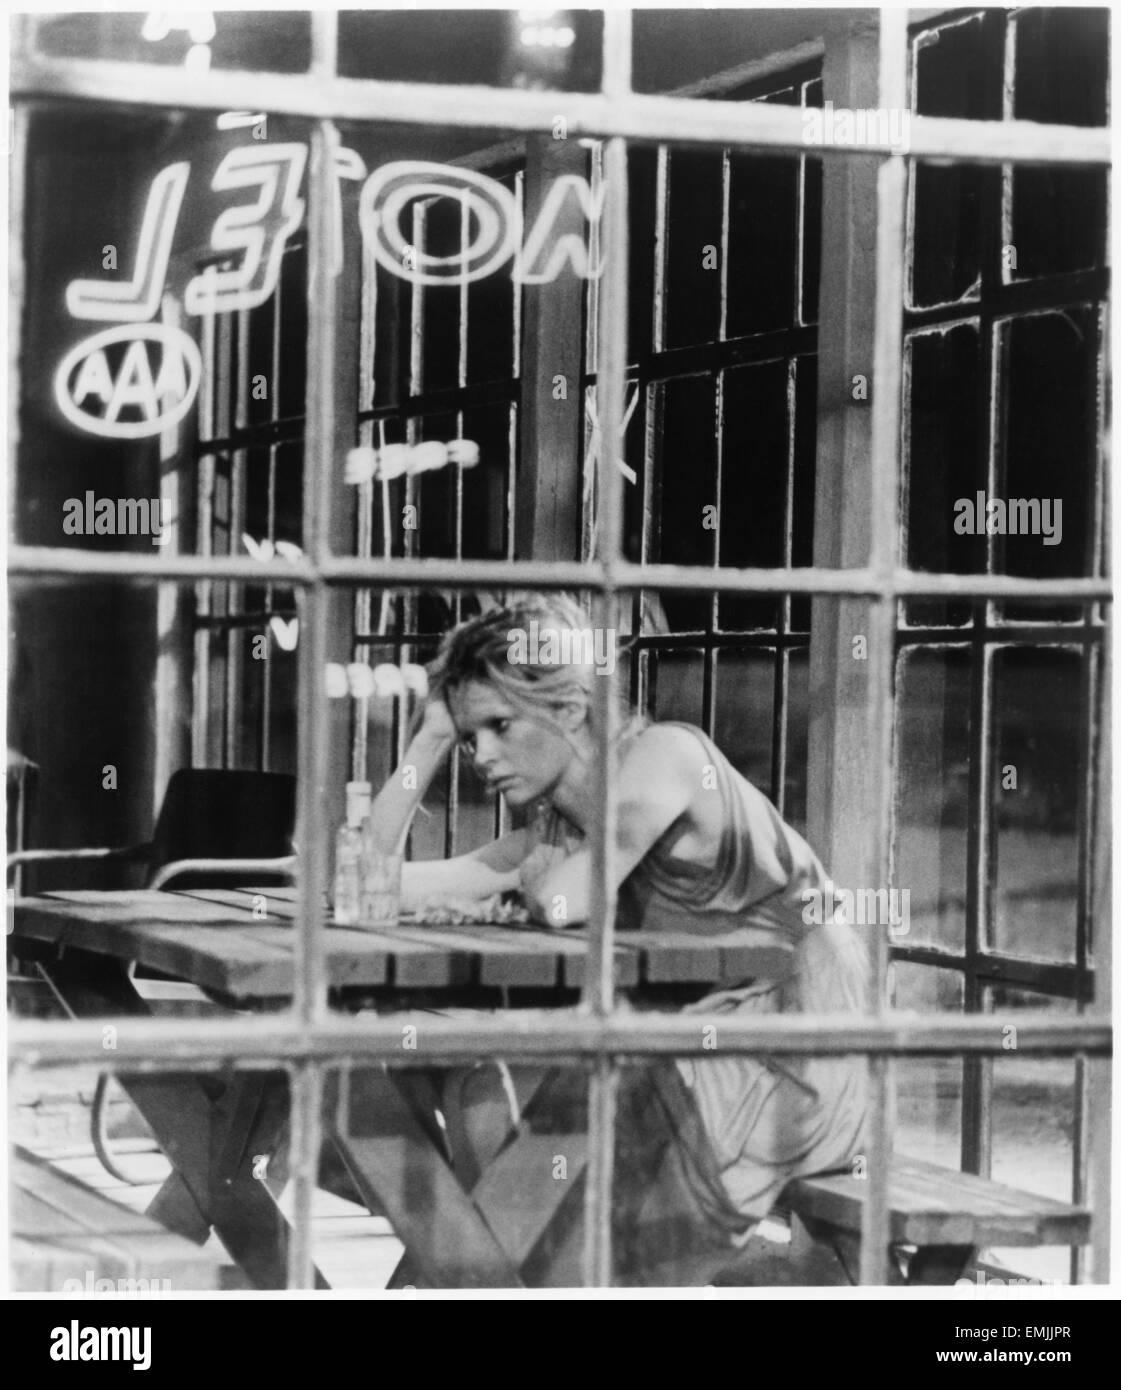 "Kim Basinger, on-set of the Film 'Fool For Love"", 1985 - Stock Image"